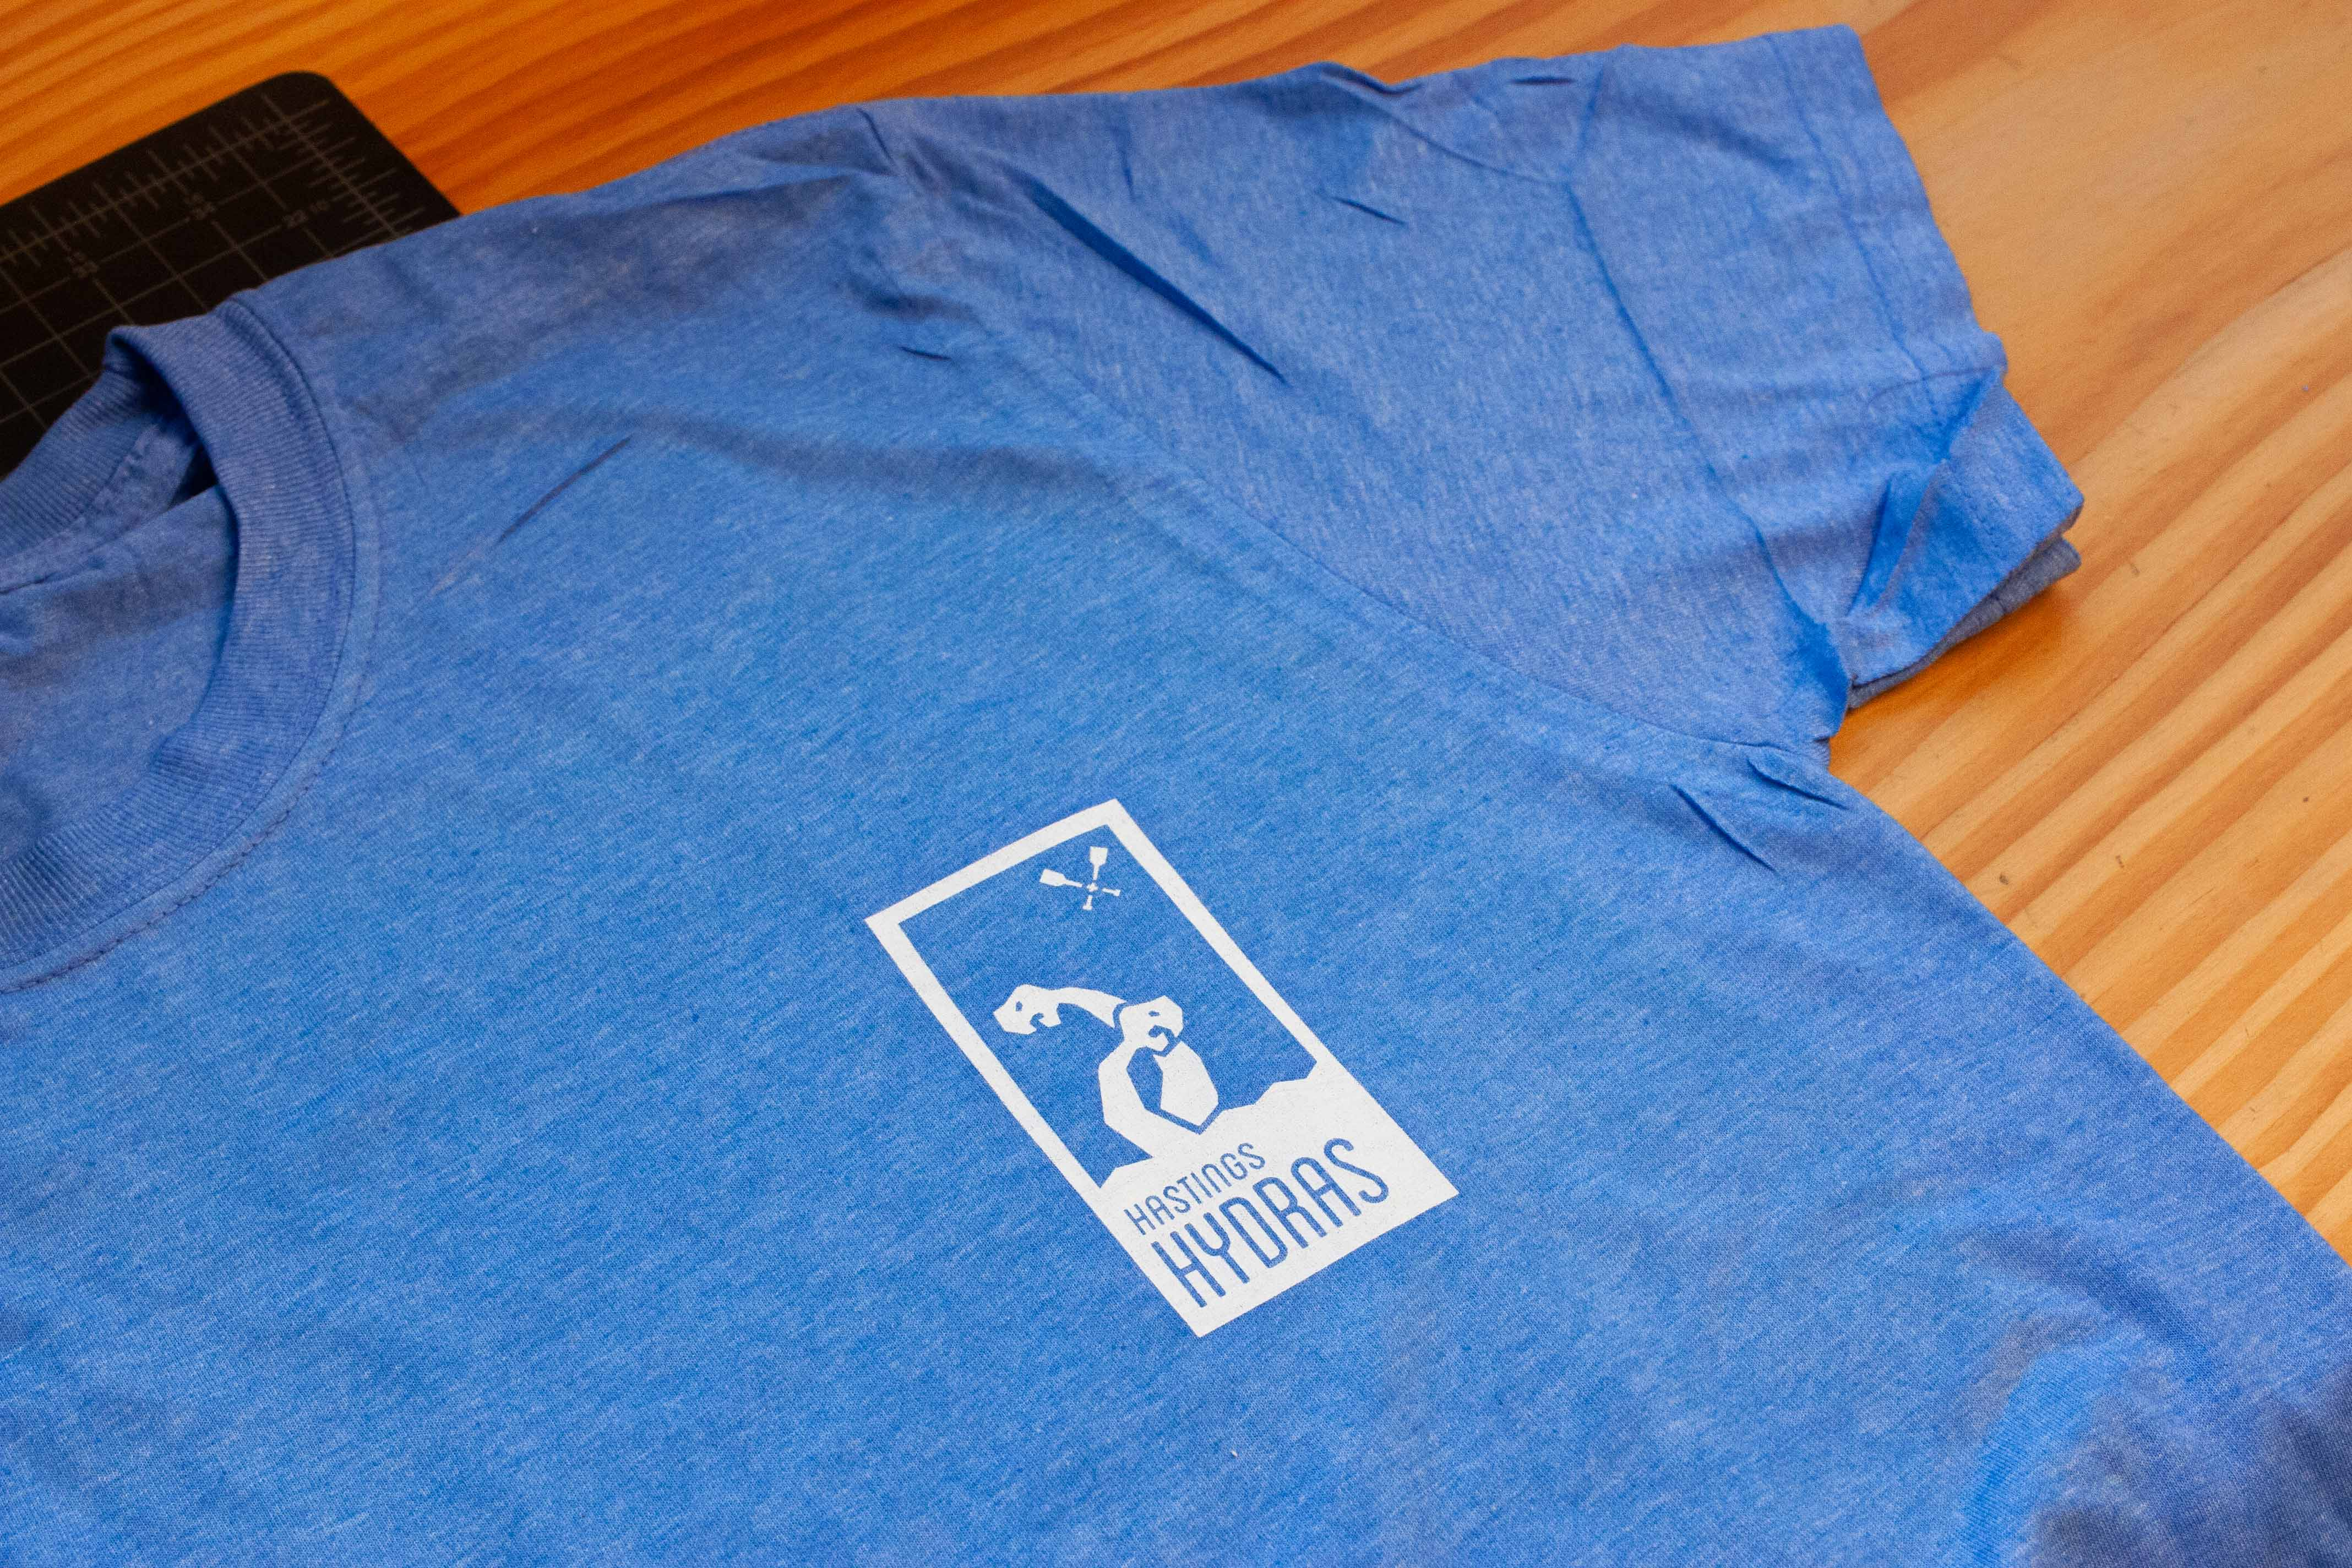 Hasting Hydras logo printed on a heather blue team shirt — by Yagnyuk.